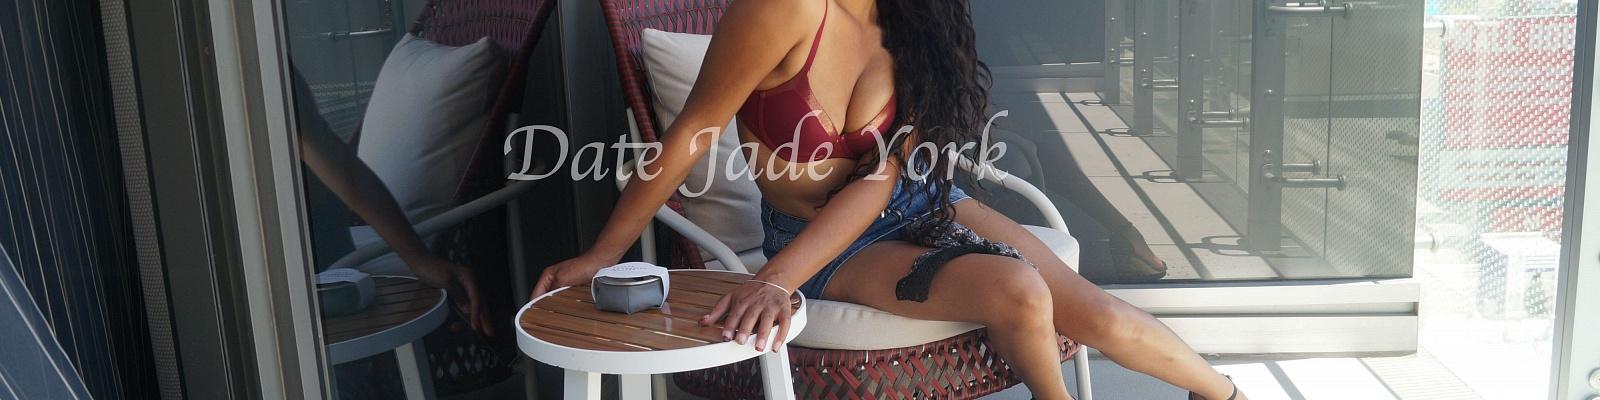 Jade York's Cover Photo